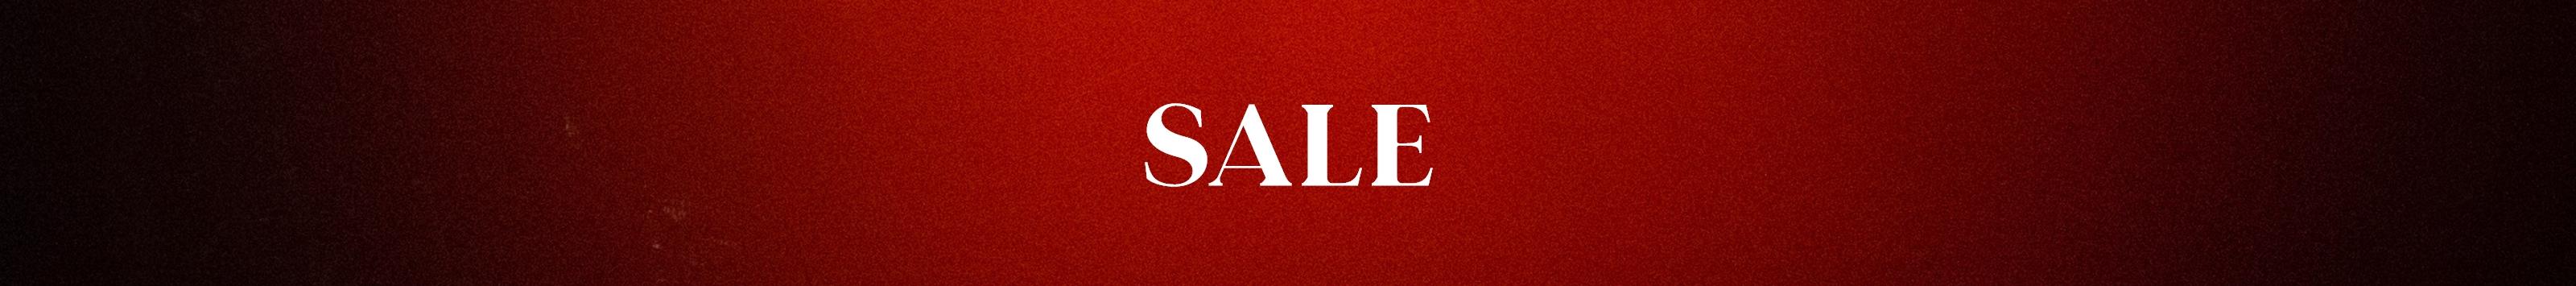 banner-category-sale.jpg